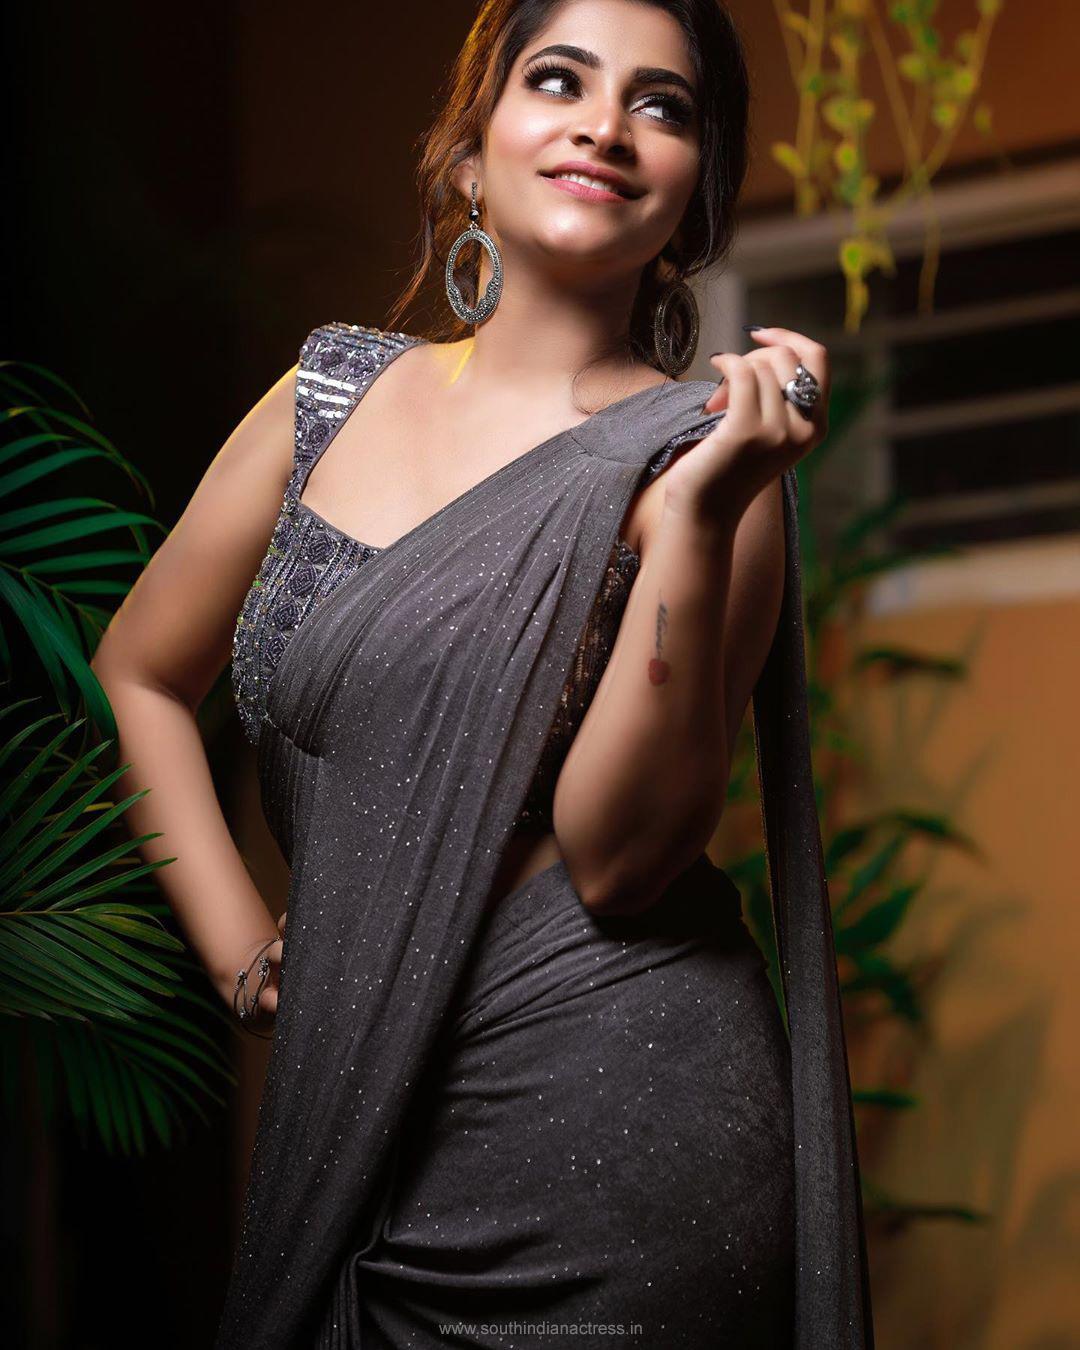 Malayalam Movie Actress Malavika Sreenath Latest Stills In Saree Photoshoot